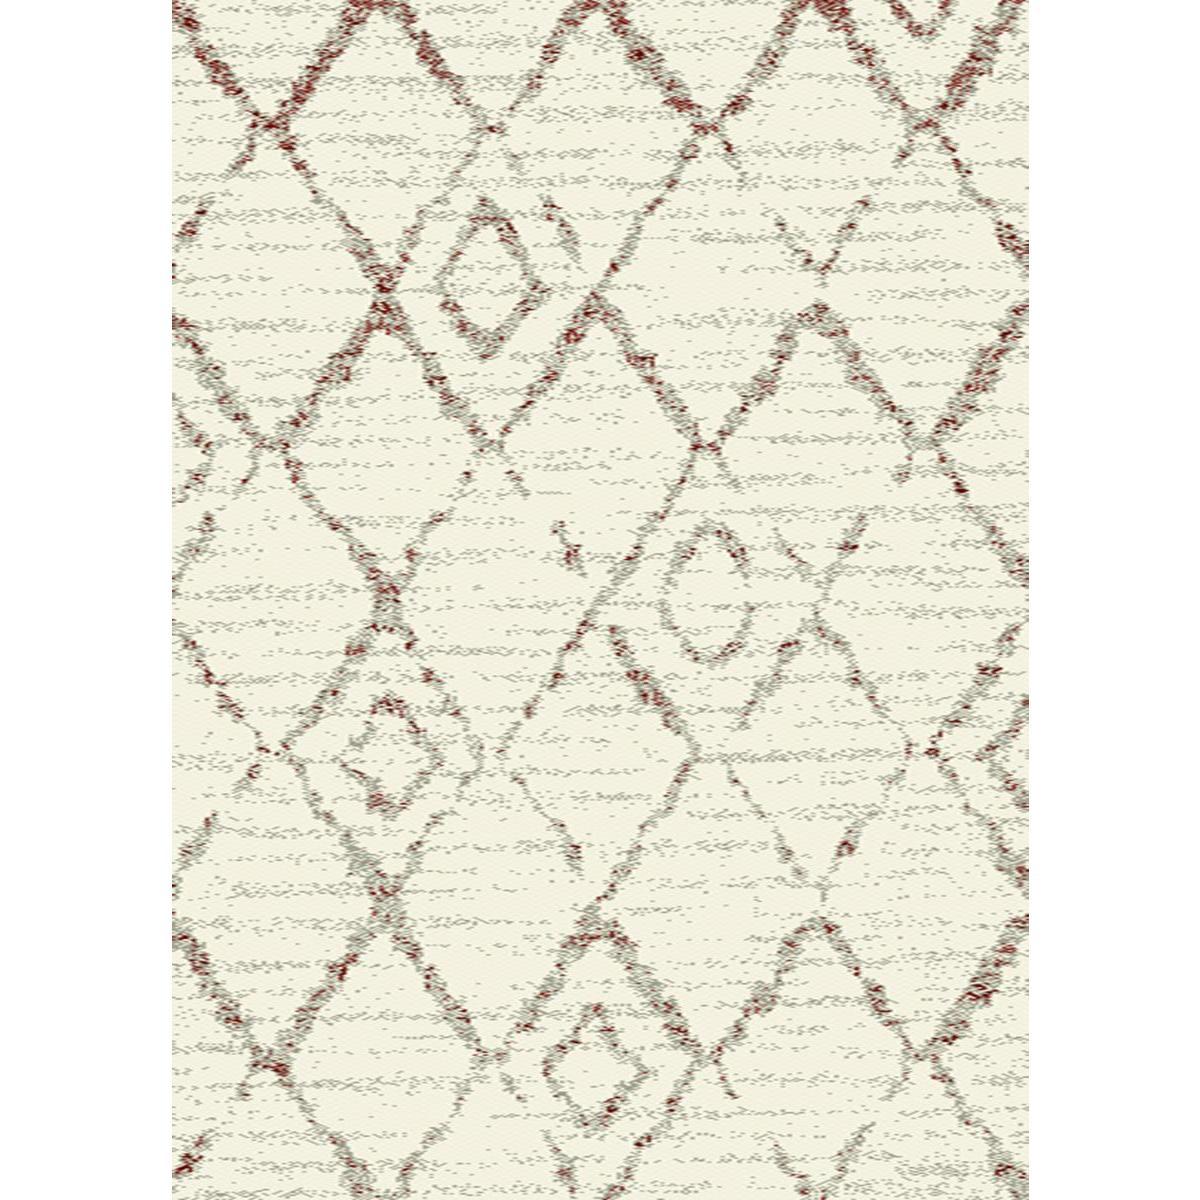 tapis sweet 160 x 230 cm beige